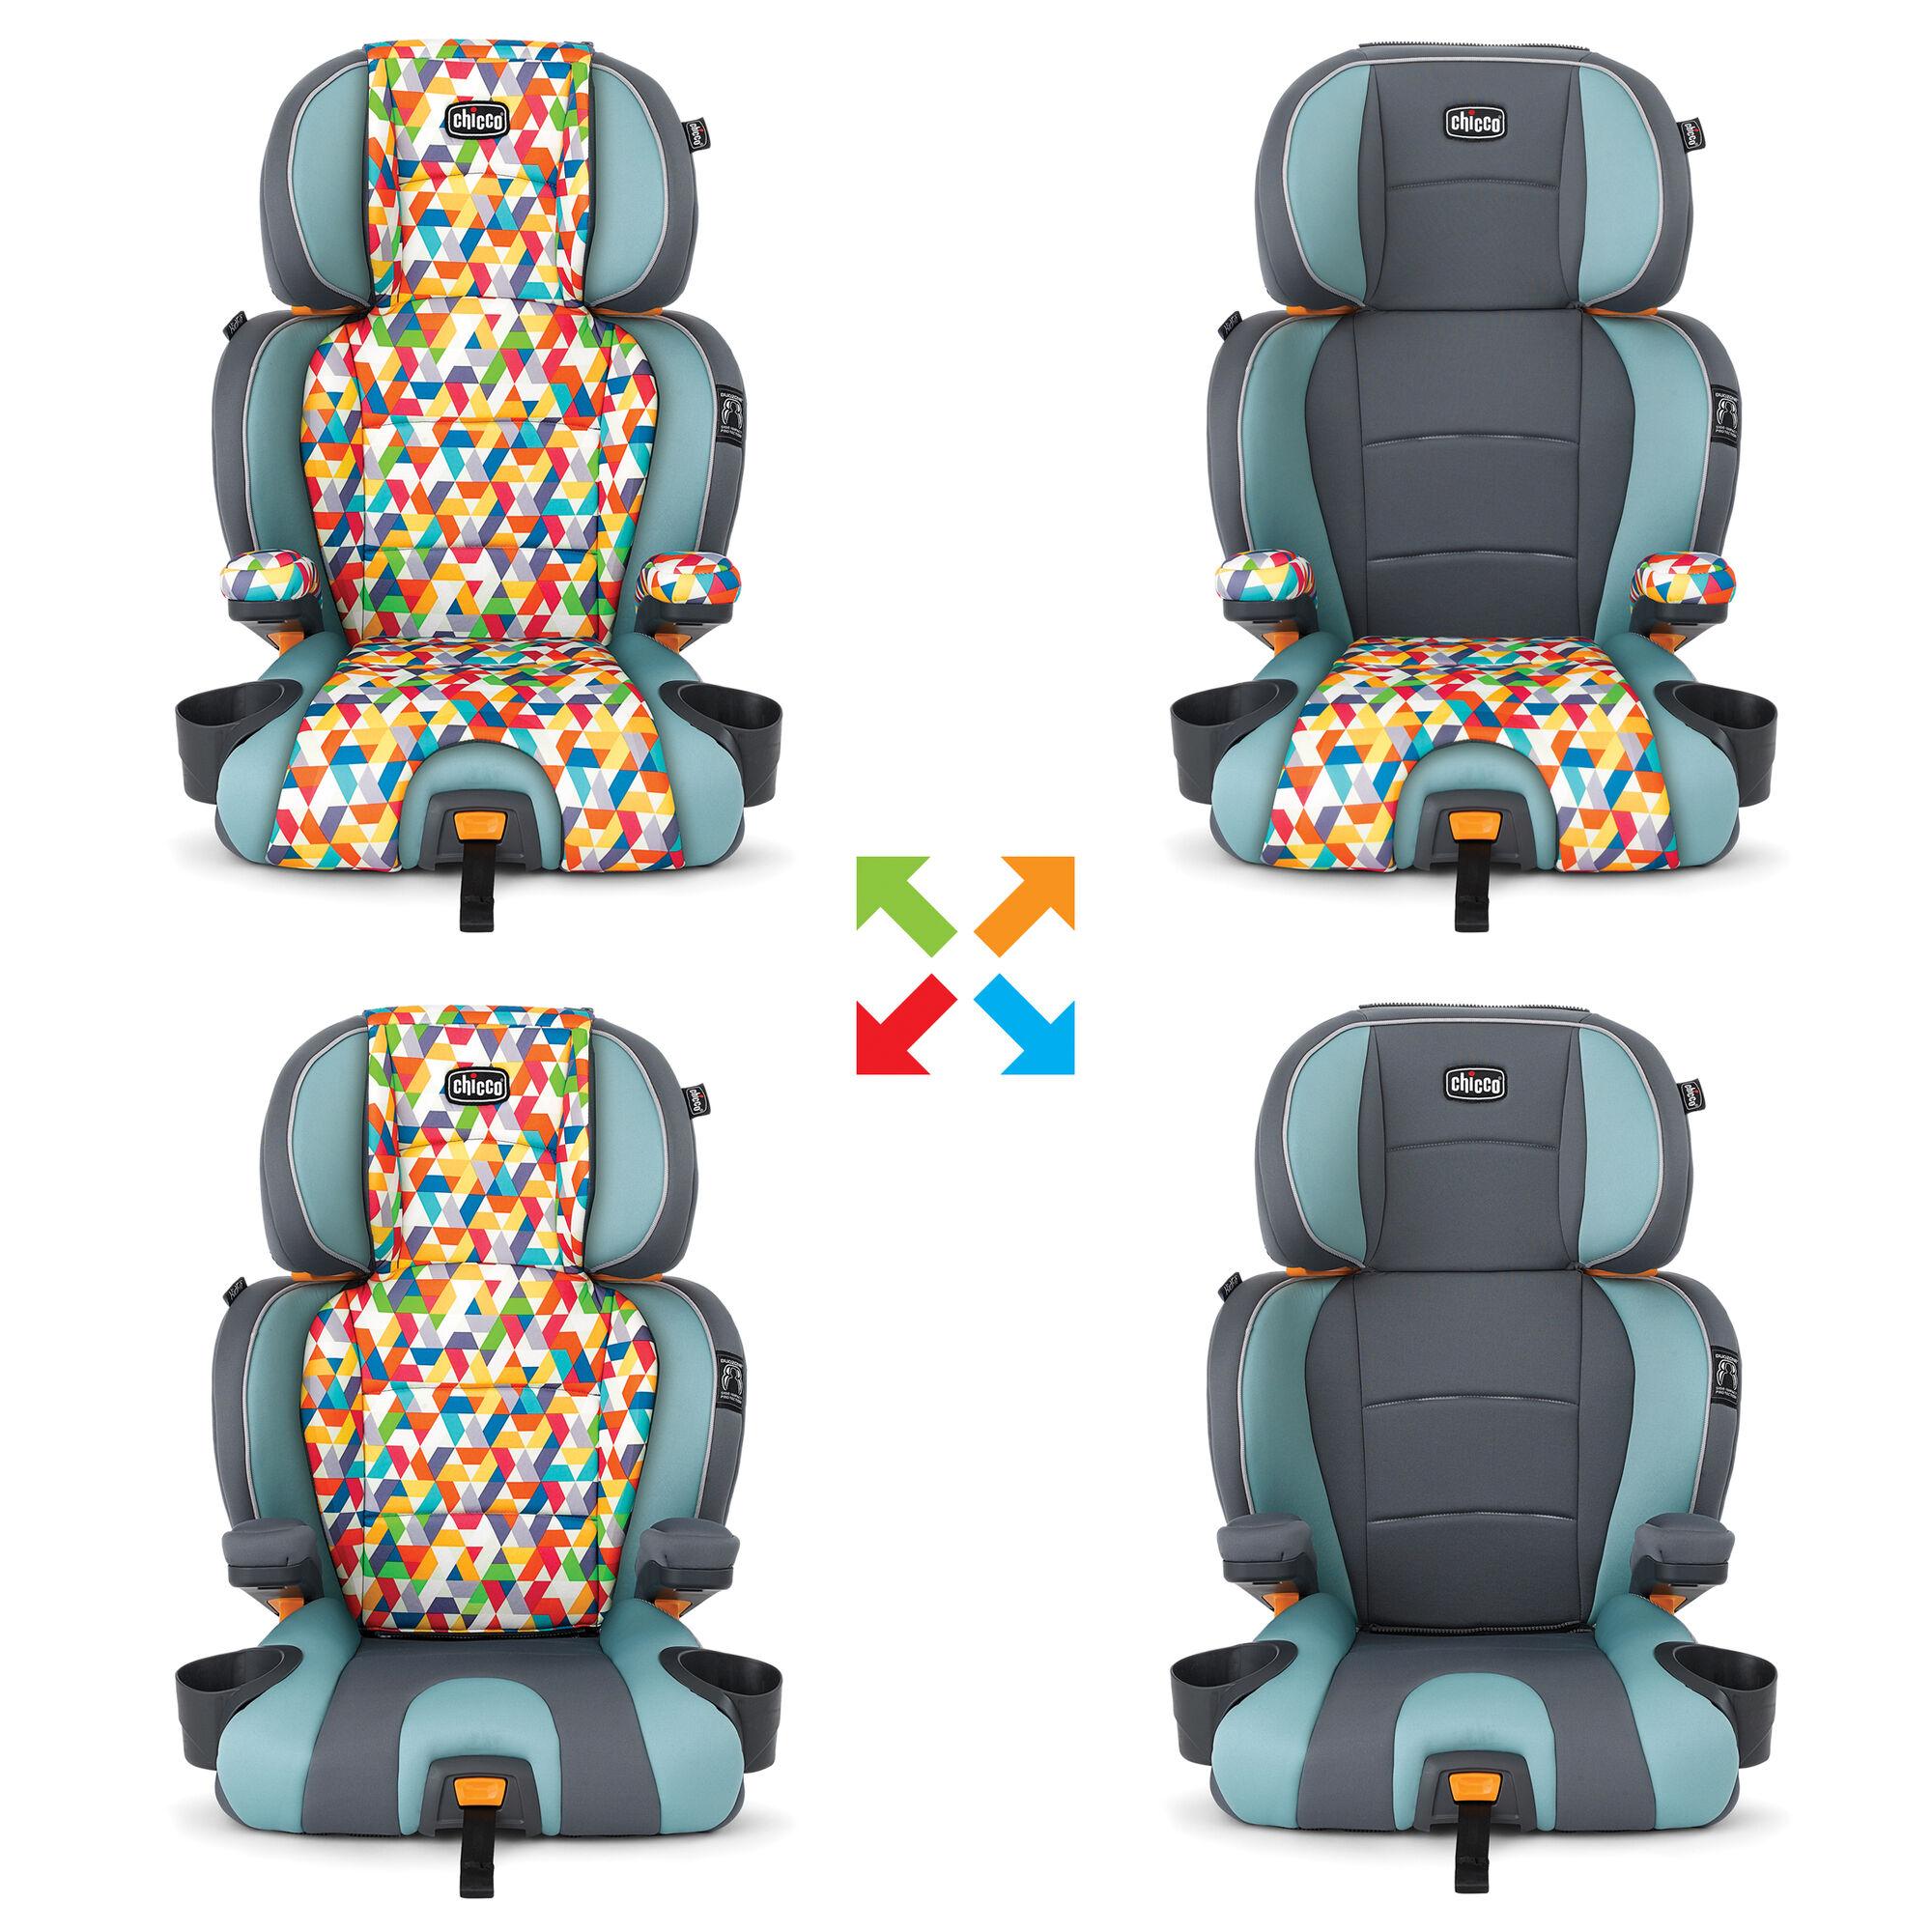 chicco kidfit zip 2 in 1 belt positioning booster seat wild. Black Bedroom Furniture Sets. Home Design Ideas